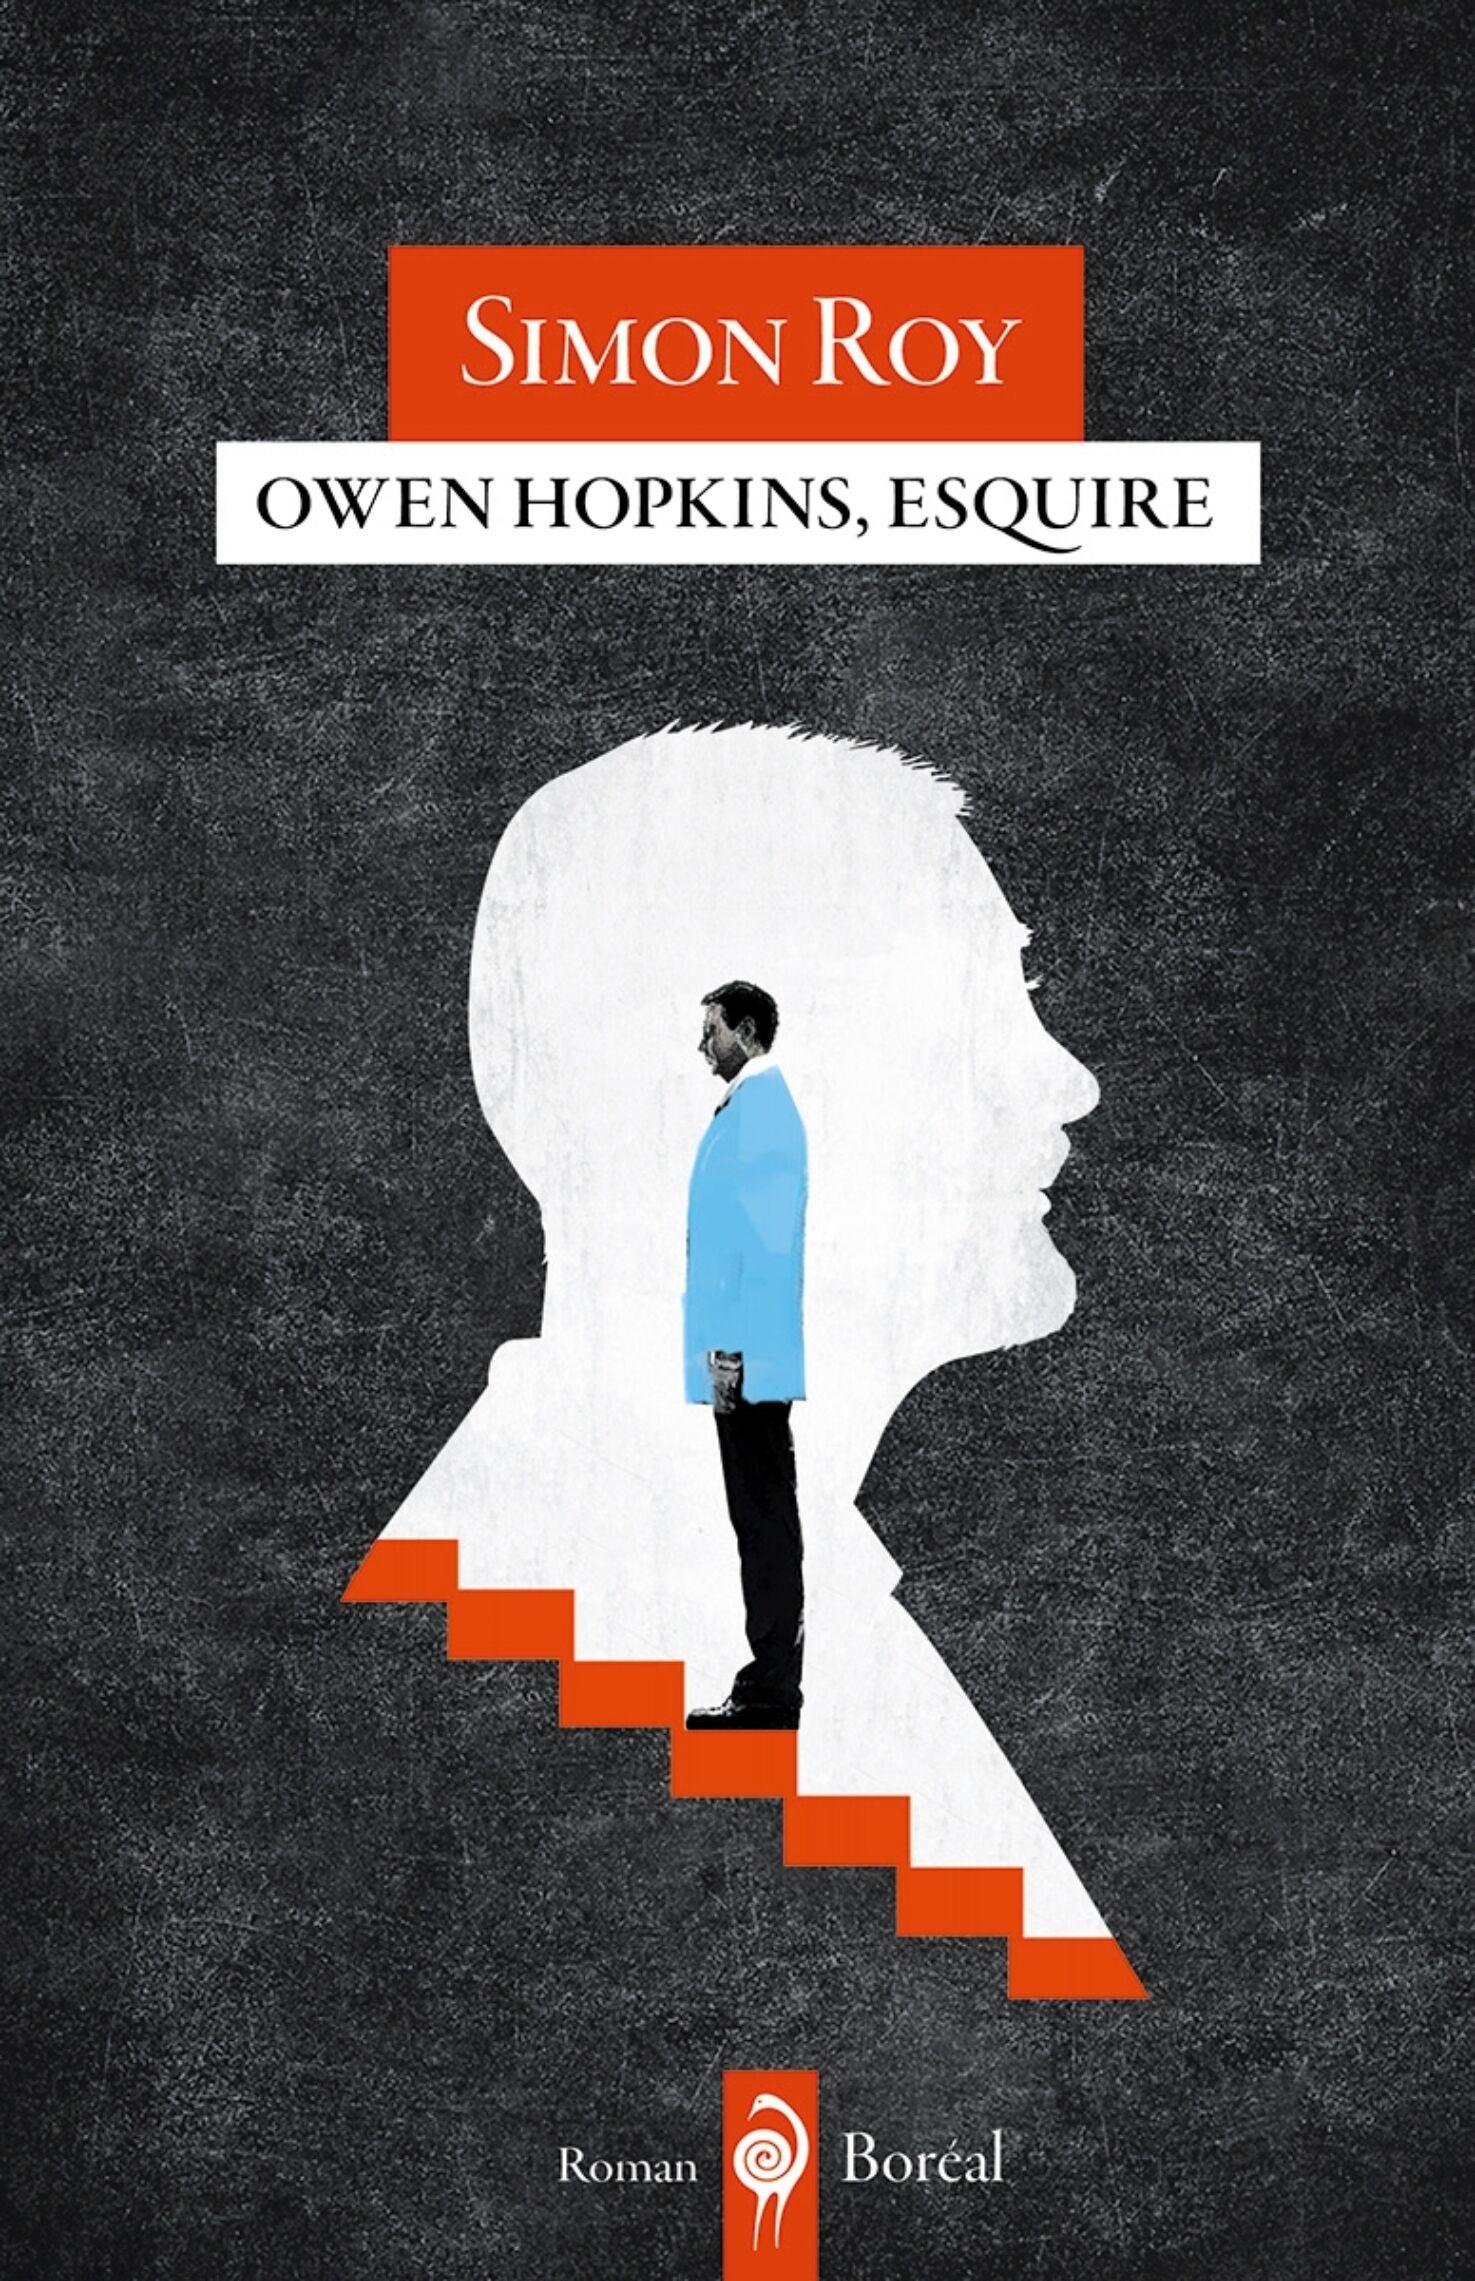 Simon Roy/Owen Hopkins Esquire